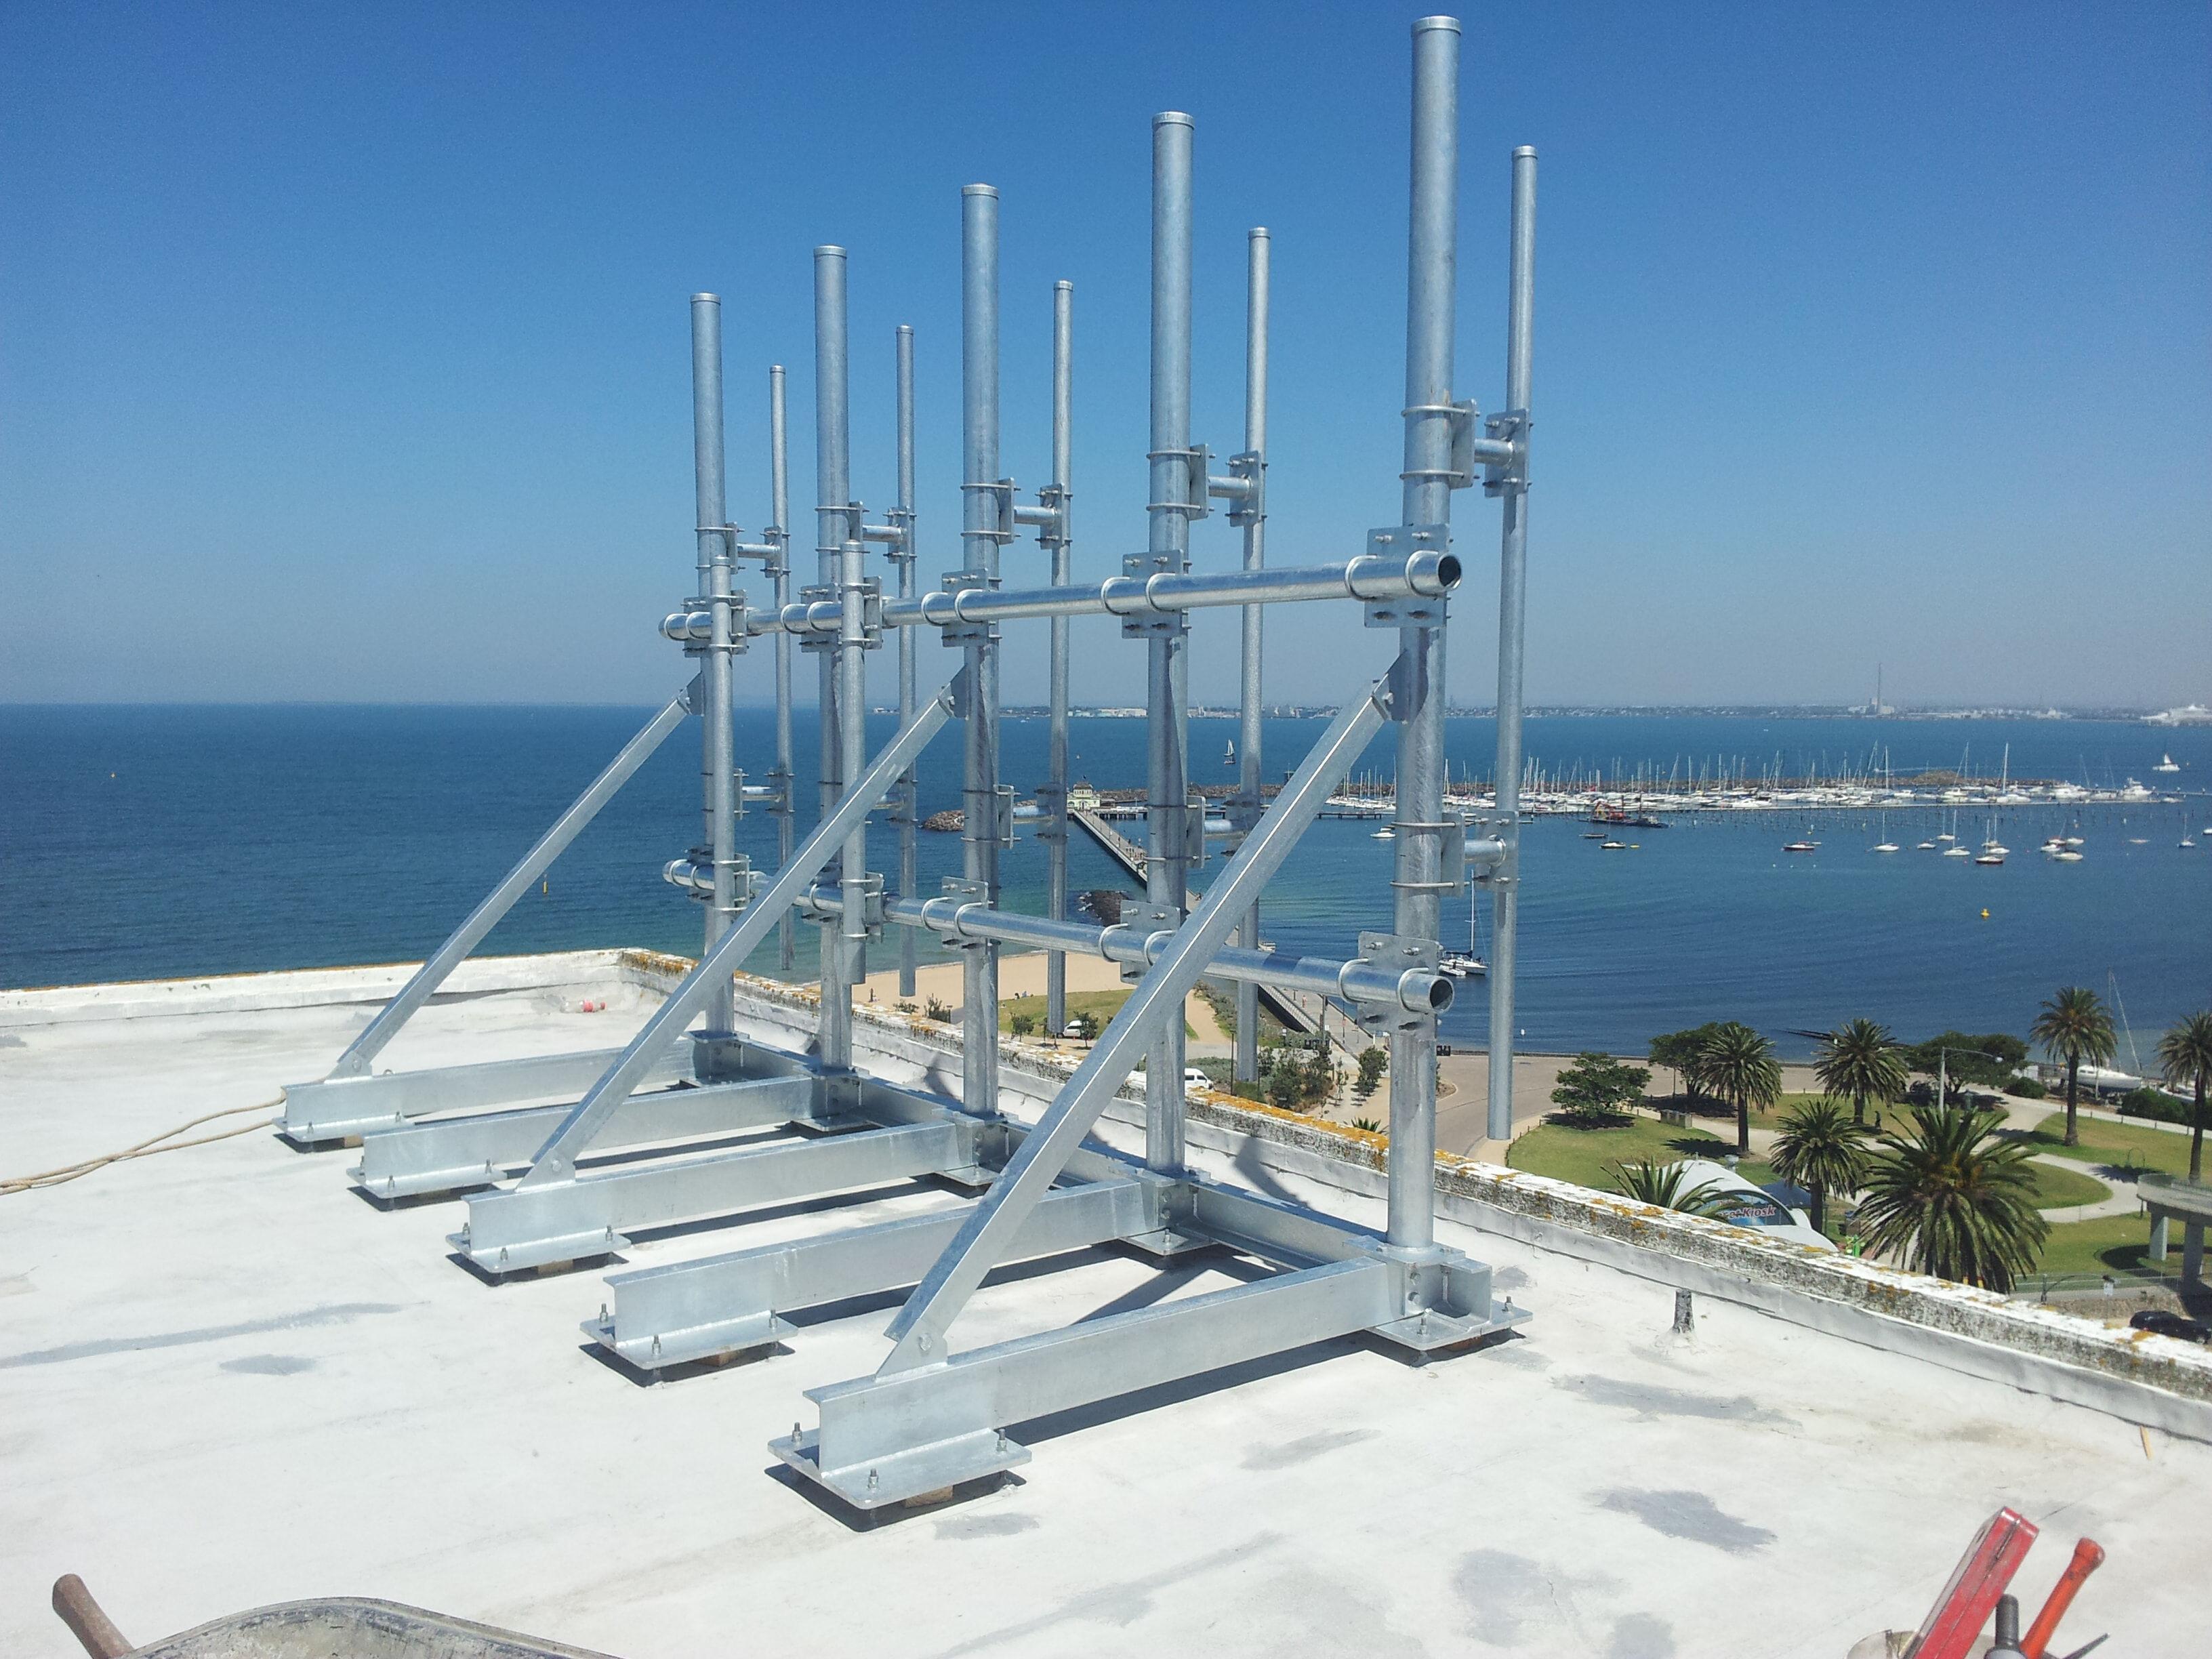 Telco Telecommunication Towers st kilda 2